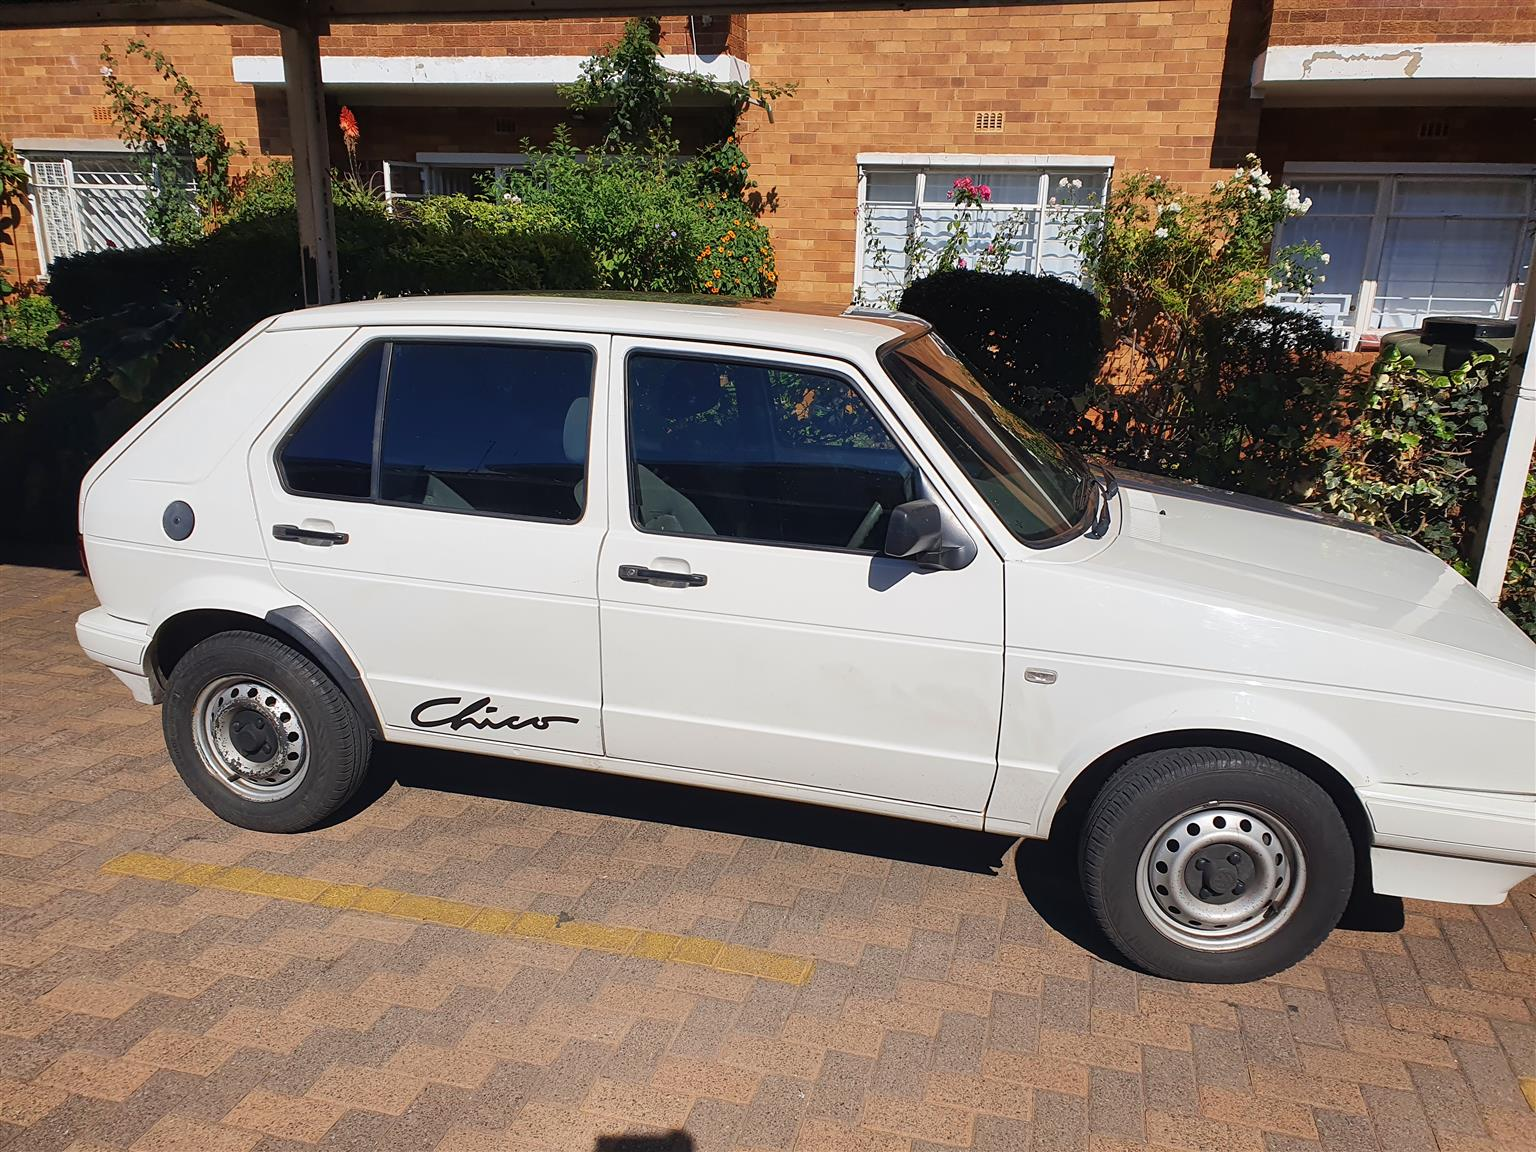 VW Citi Golf Chico for sale. 2007 model. Full service history. Good condition